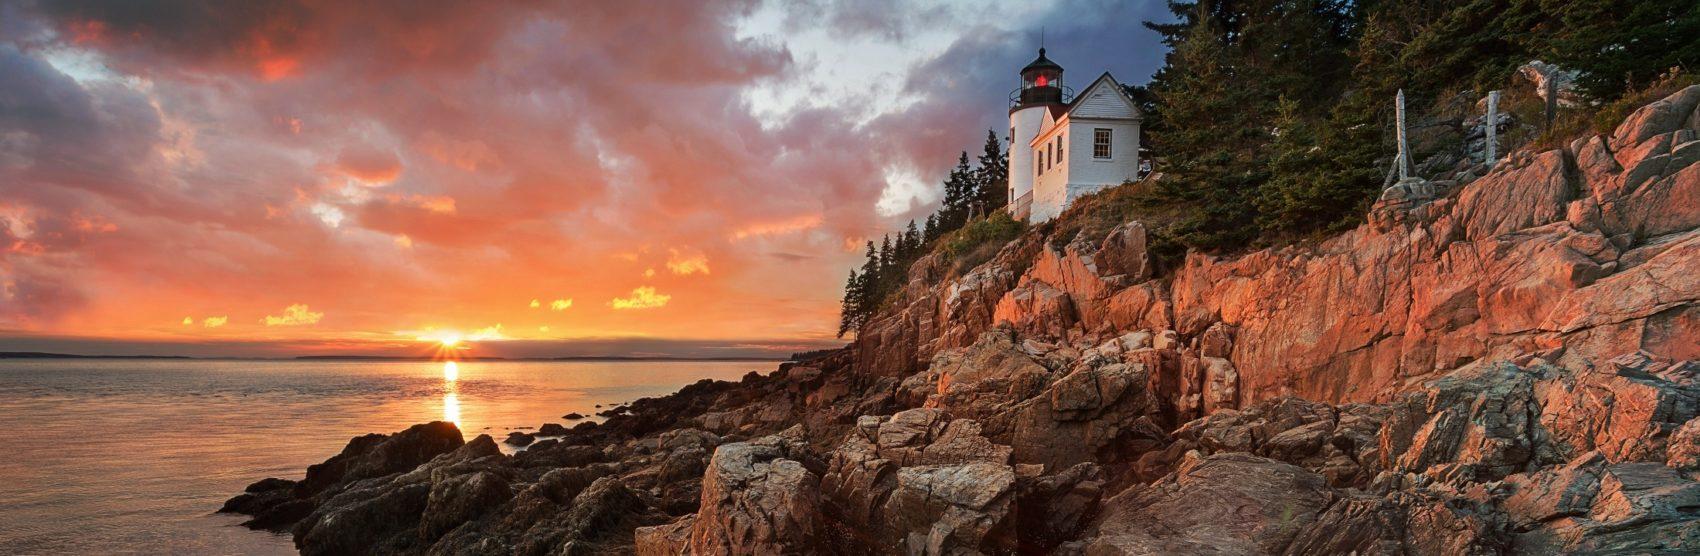 New England holidays coast